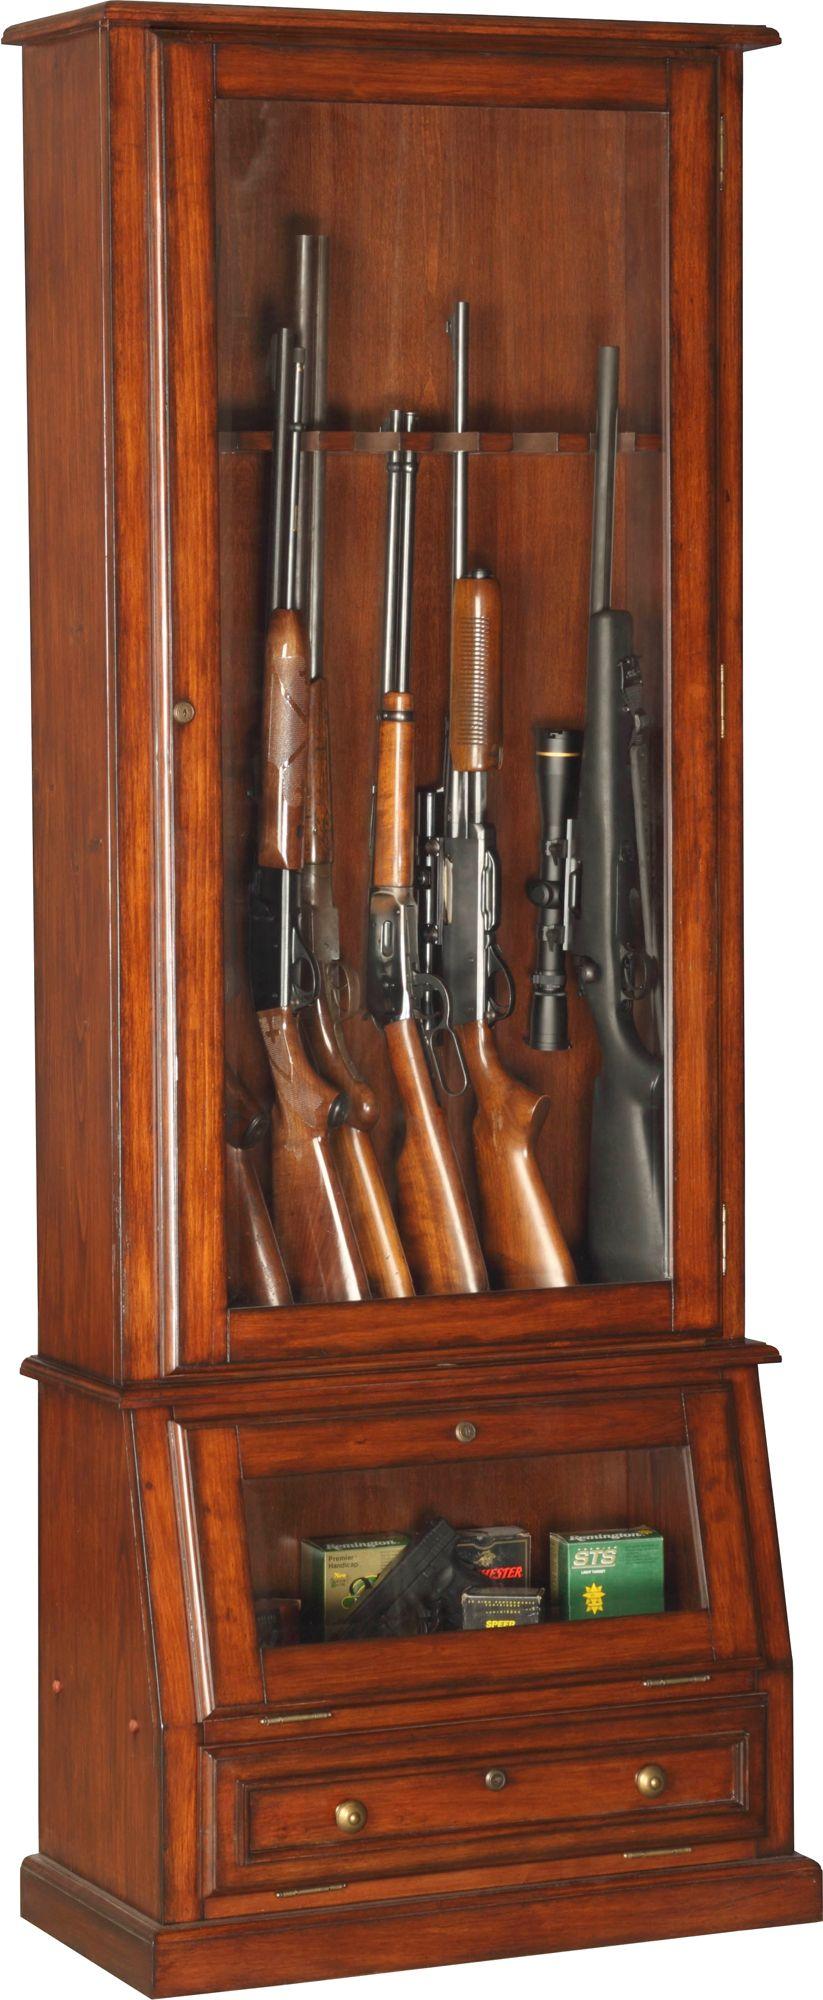 American Furniture Classics 12 Gun Slanted Base Cabinet, Size: Large thumbnail